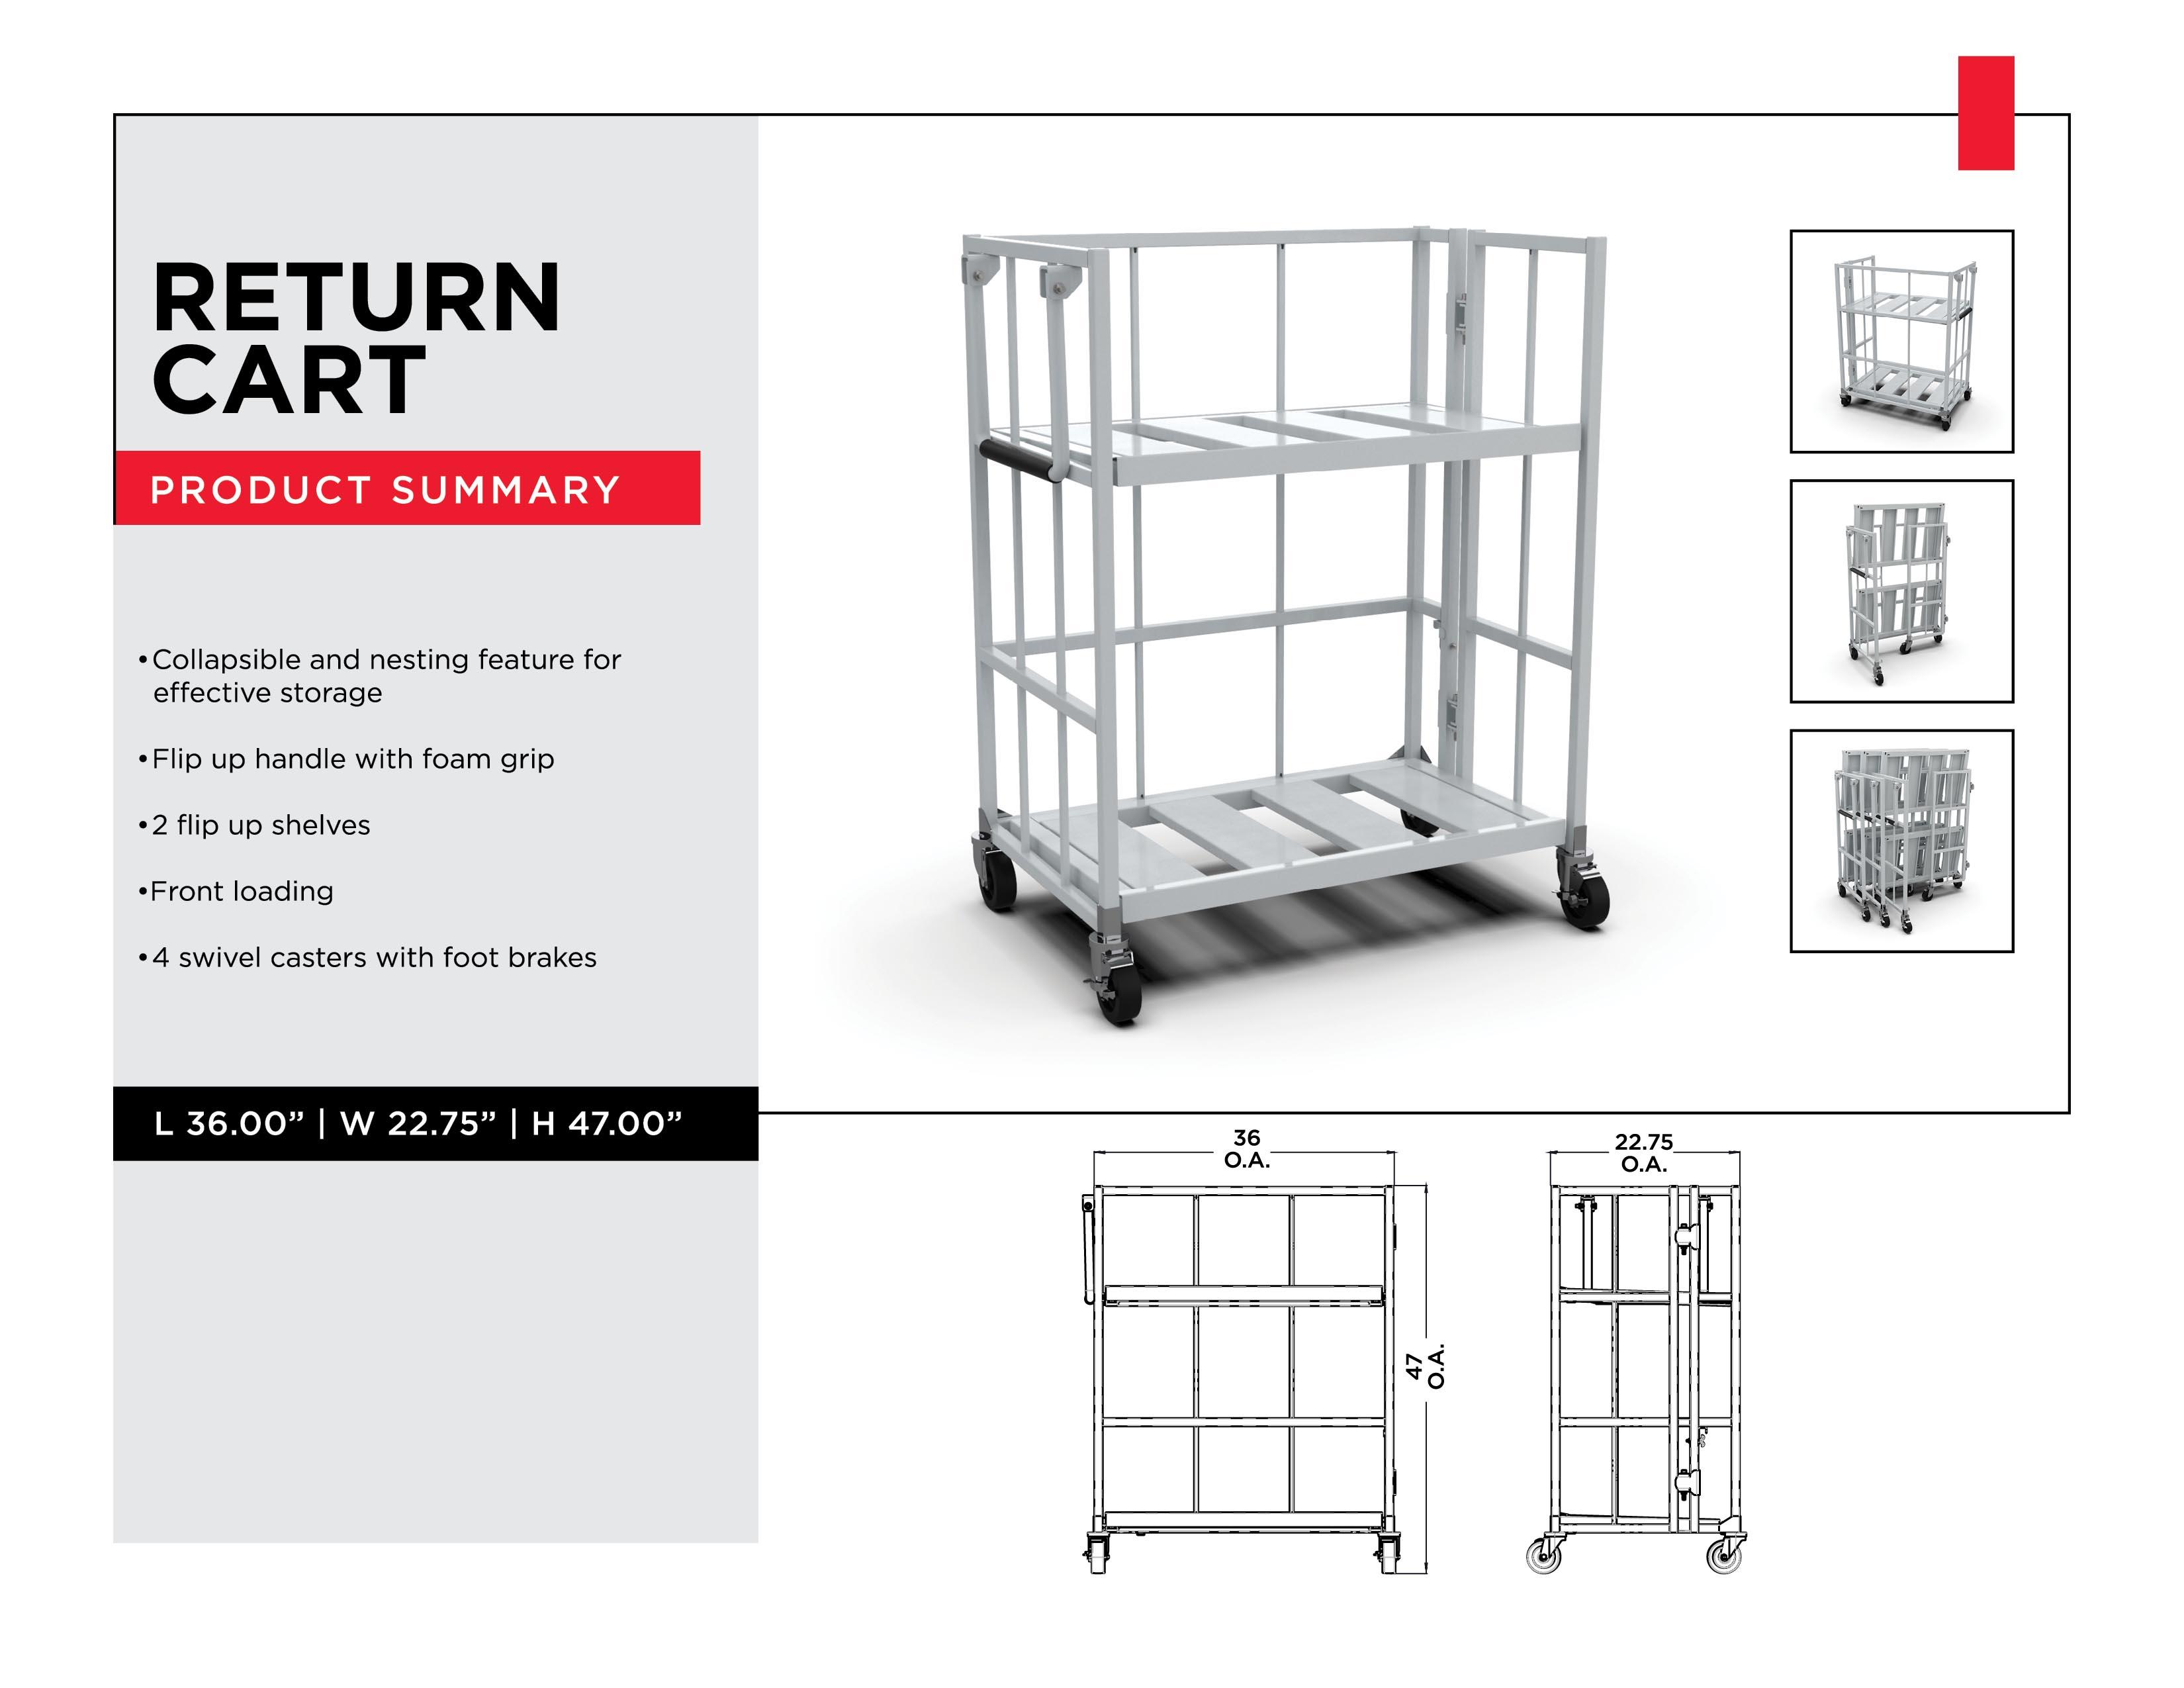 Retail Inventory Management: Return Cart